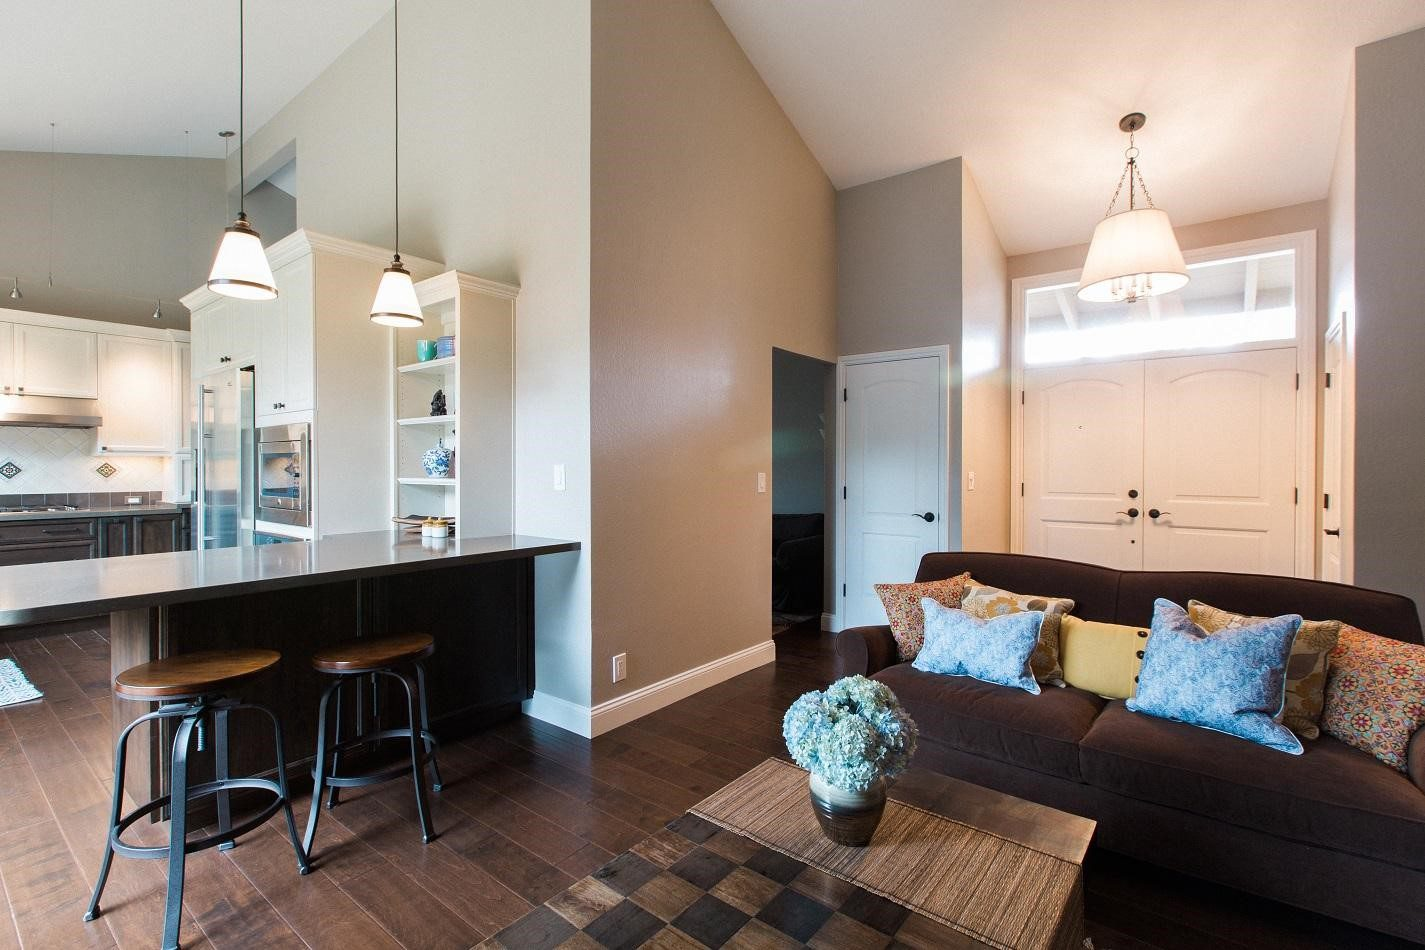 Decor ideas for open floor plans case san jose - Open floor plan design ...